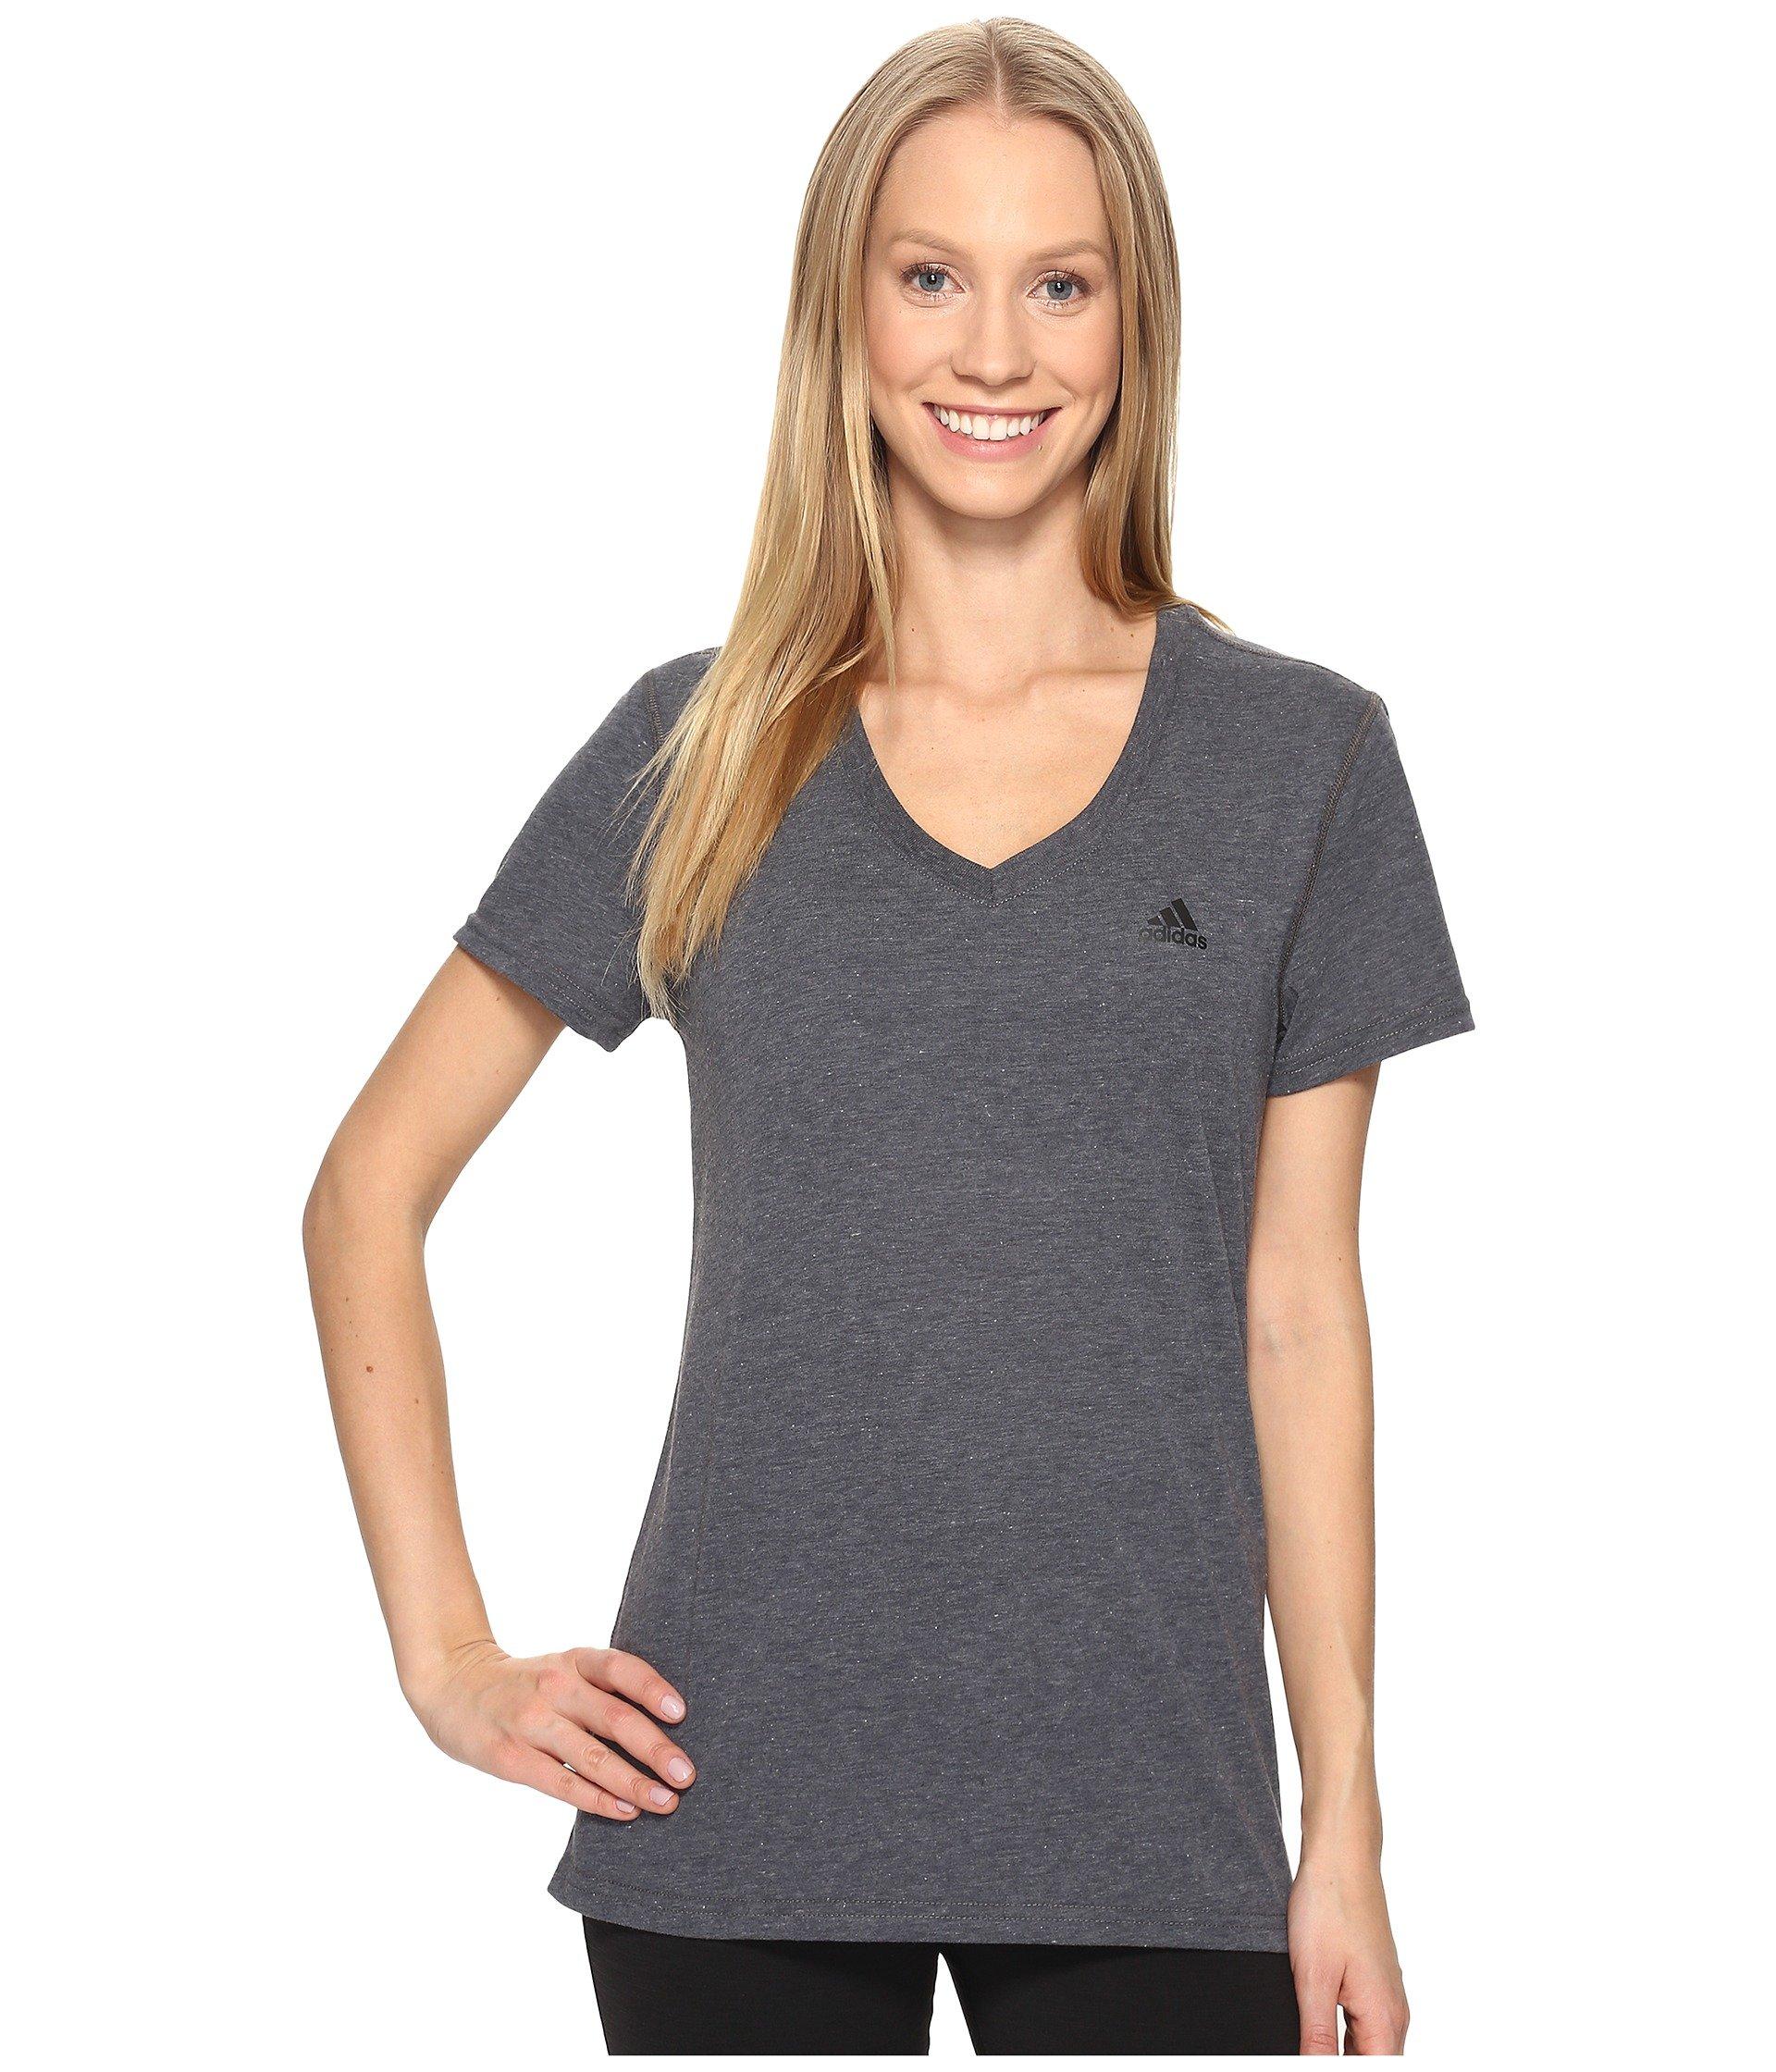 adidas Women's Training Ultimate Short Sleeve V-Neck Tee, Dark Grey Heather/Black, X-Small